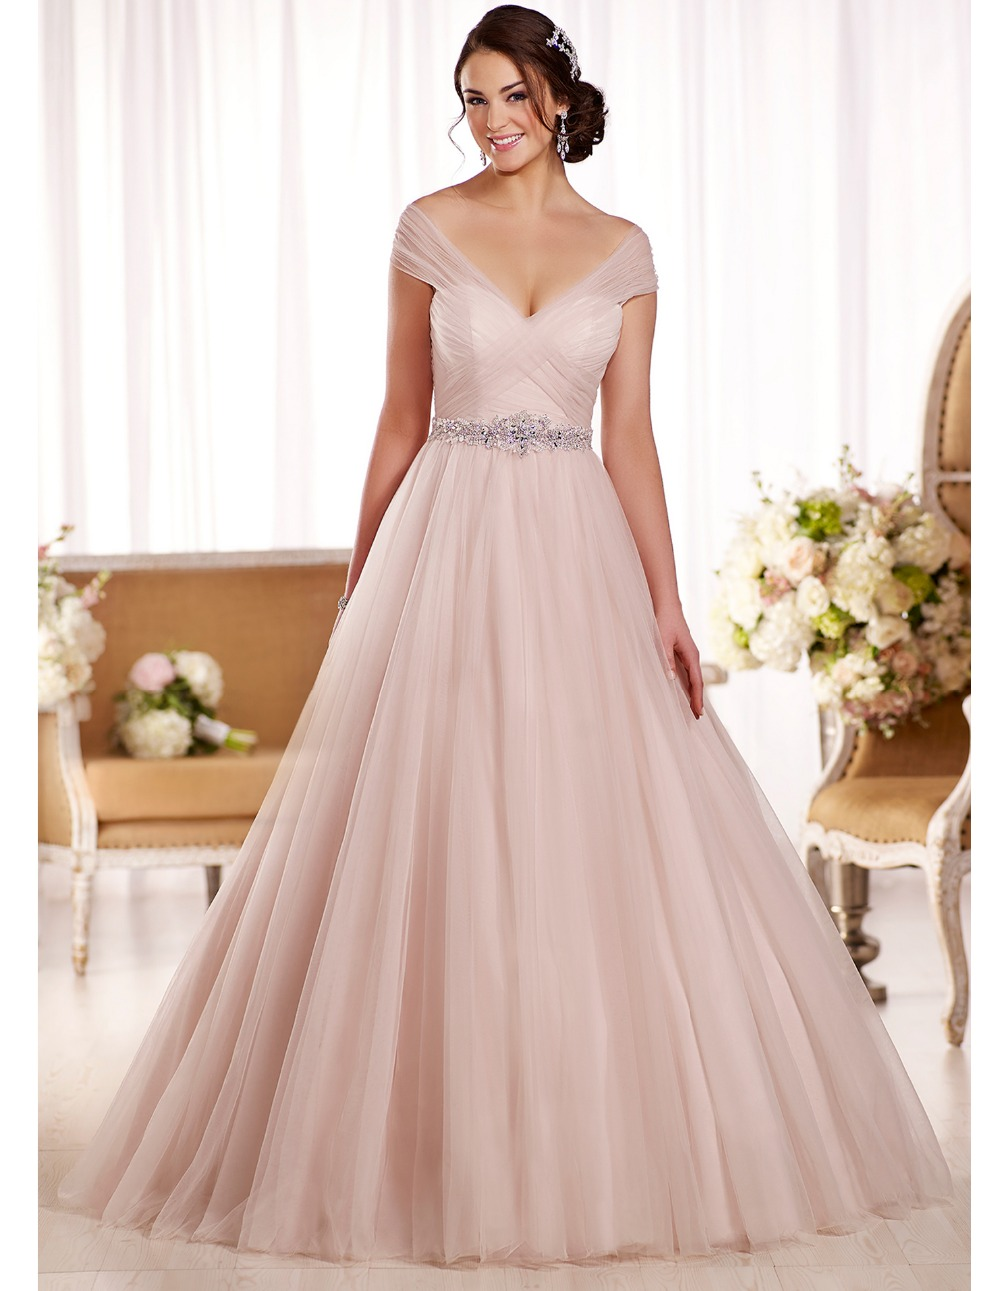 Elegant Blush Pink Cap Sleeve Wedding Dress A Line Plus Size Crystal 2016  See Through Bridal Gowns Vestidos De Novias TD_565 In Wedding Dresses From  ...